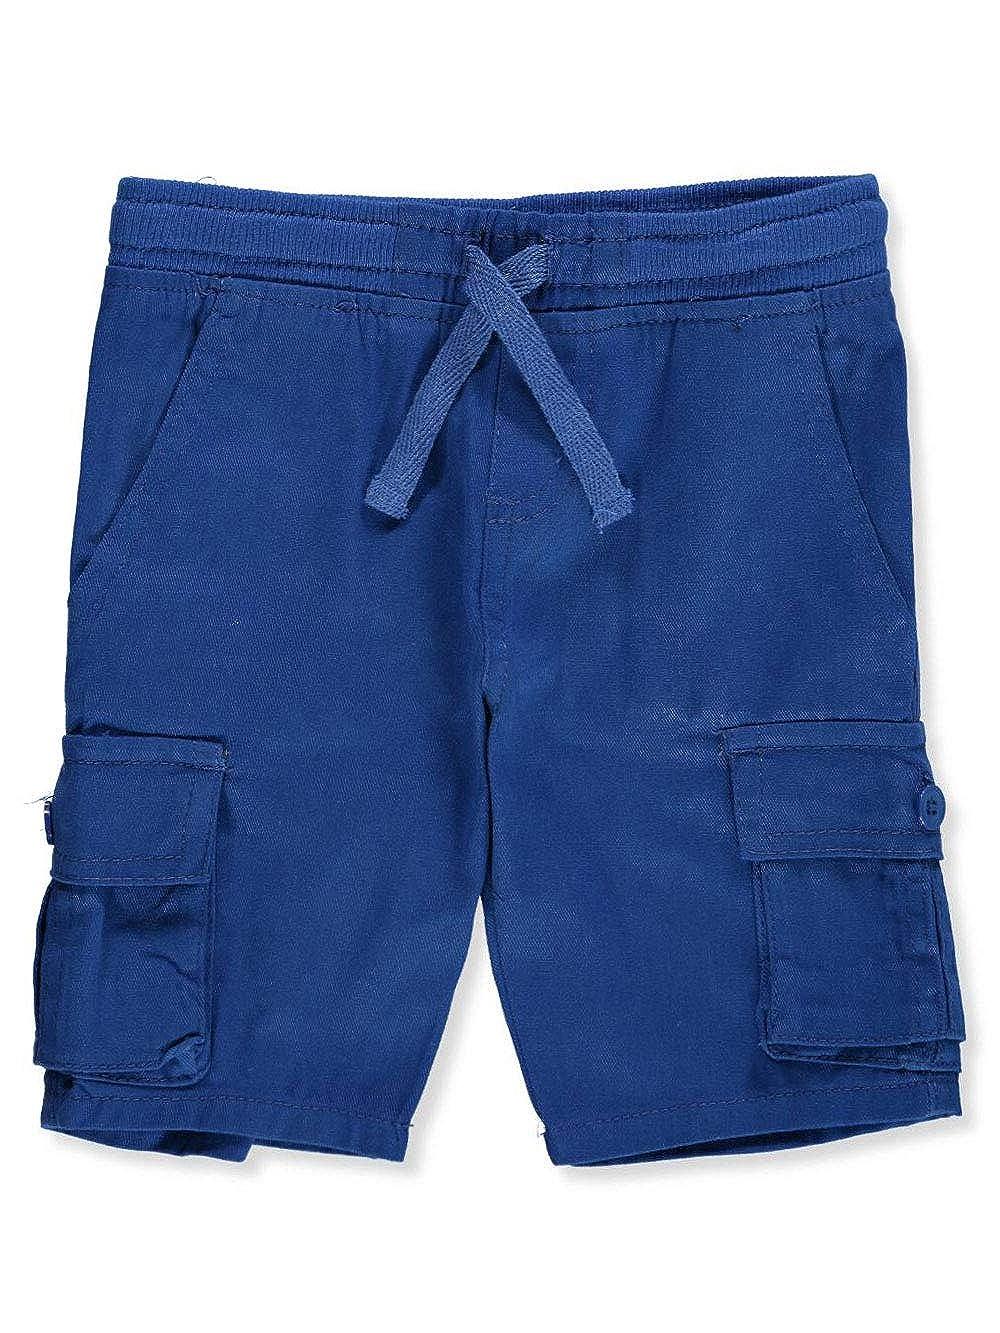 Quad Seven Boys Cargo Shorts